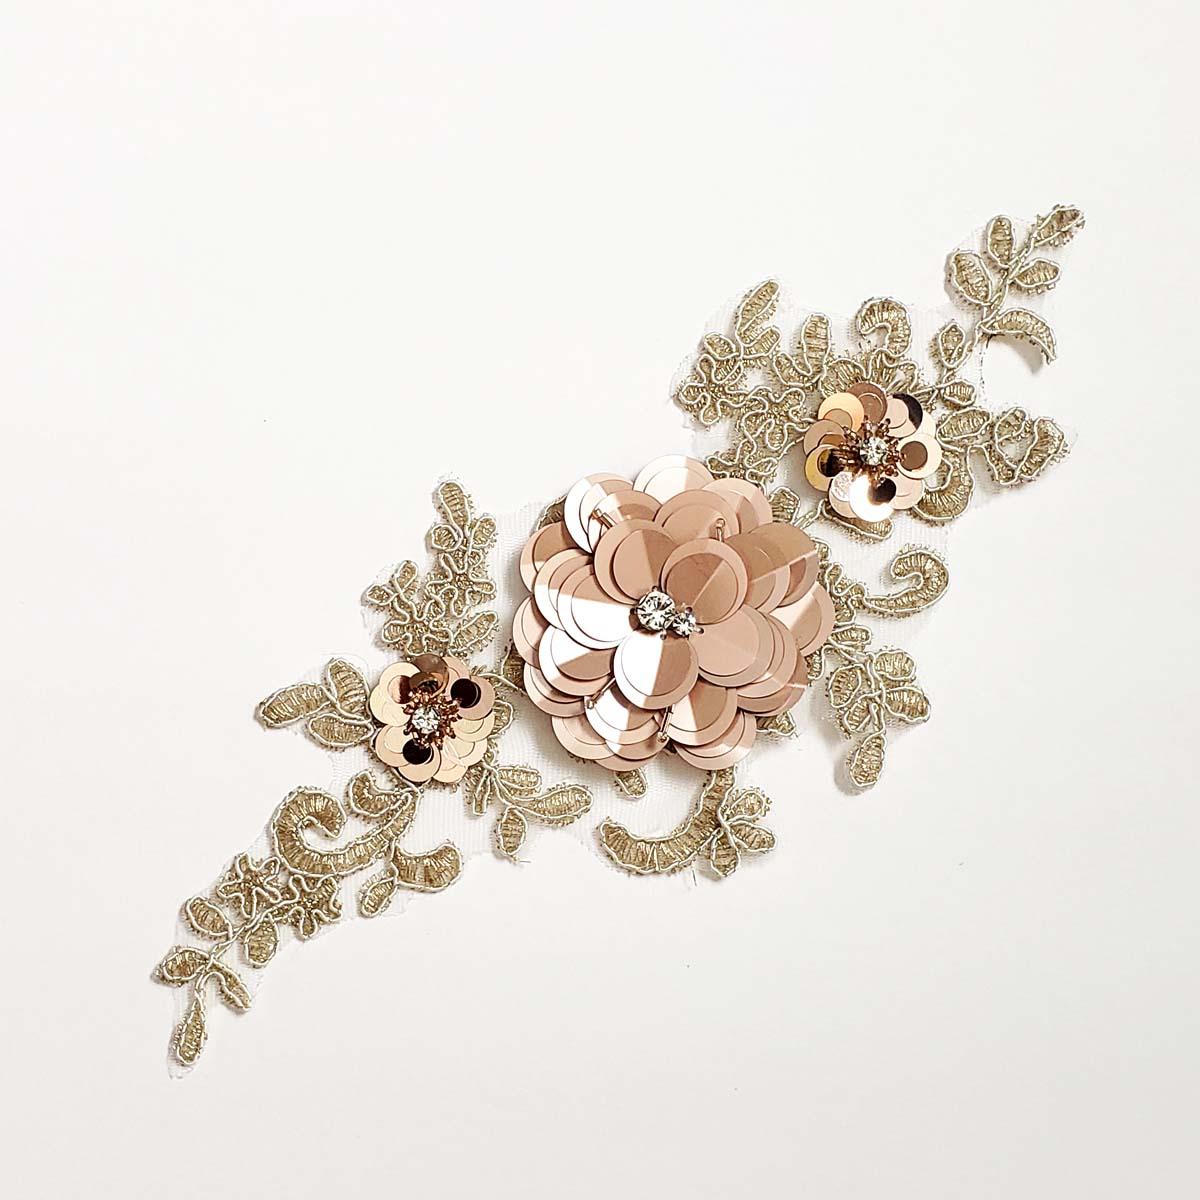 3D Metallic Applique Rose Gold and Blush1